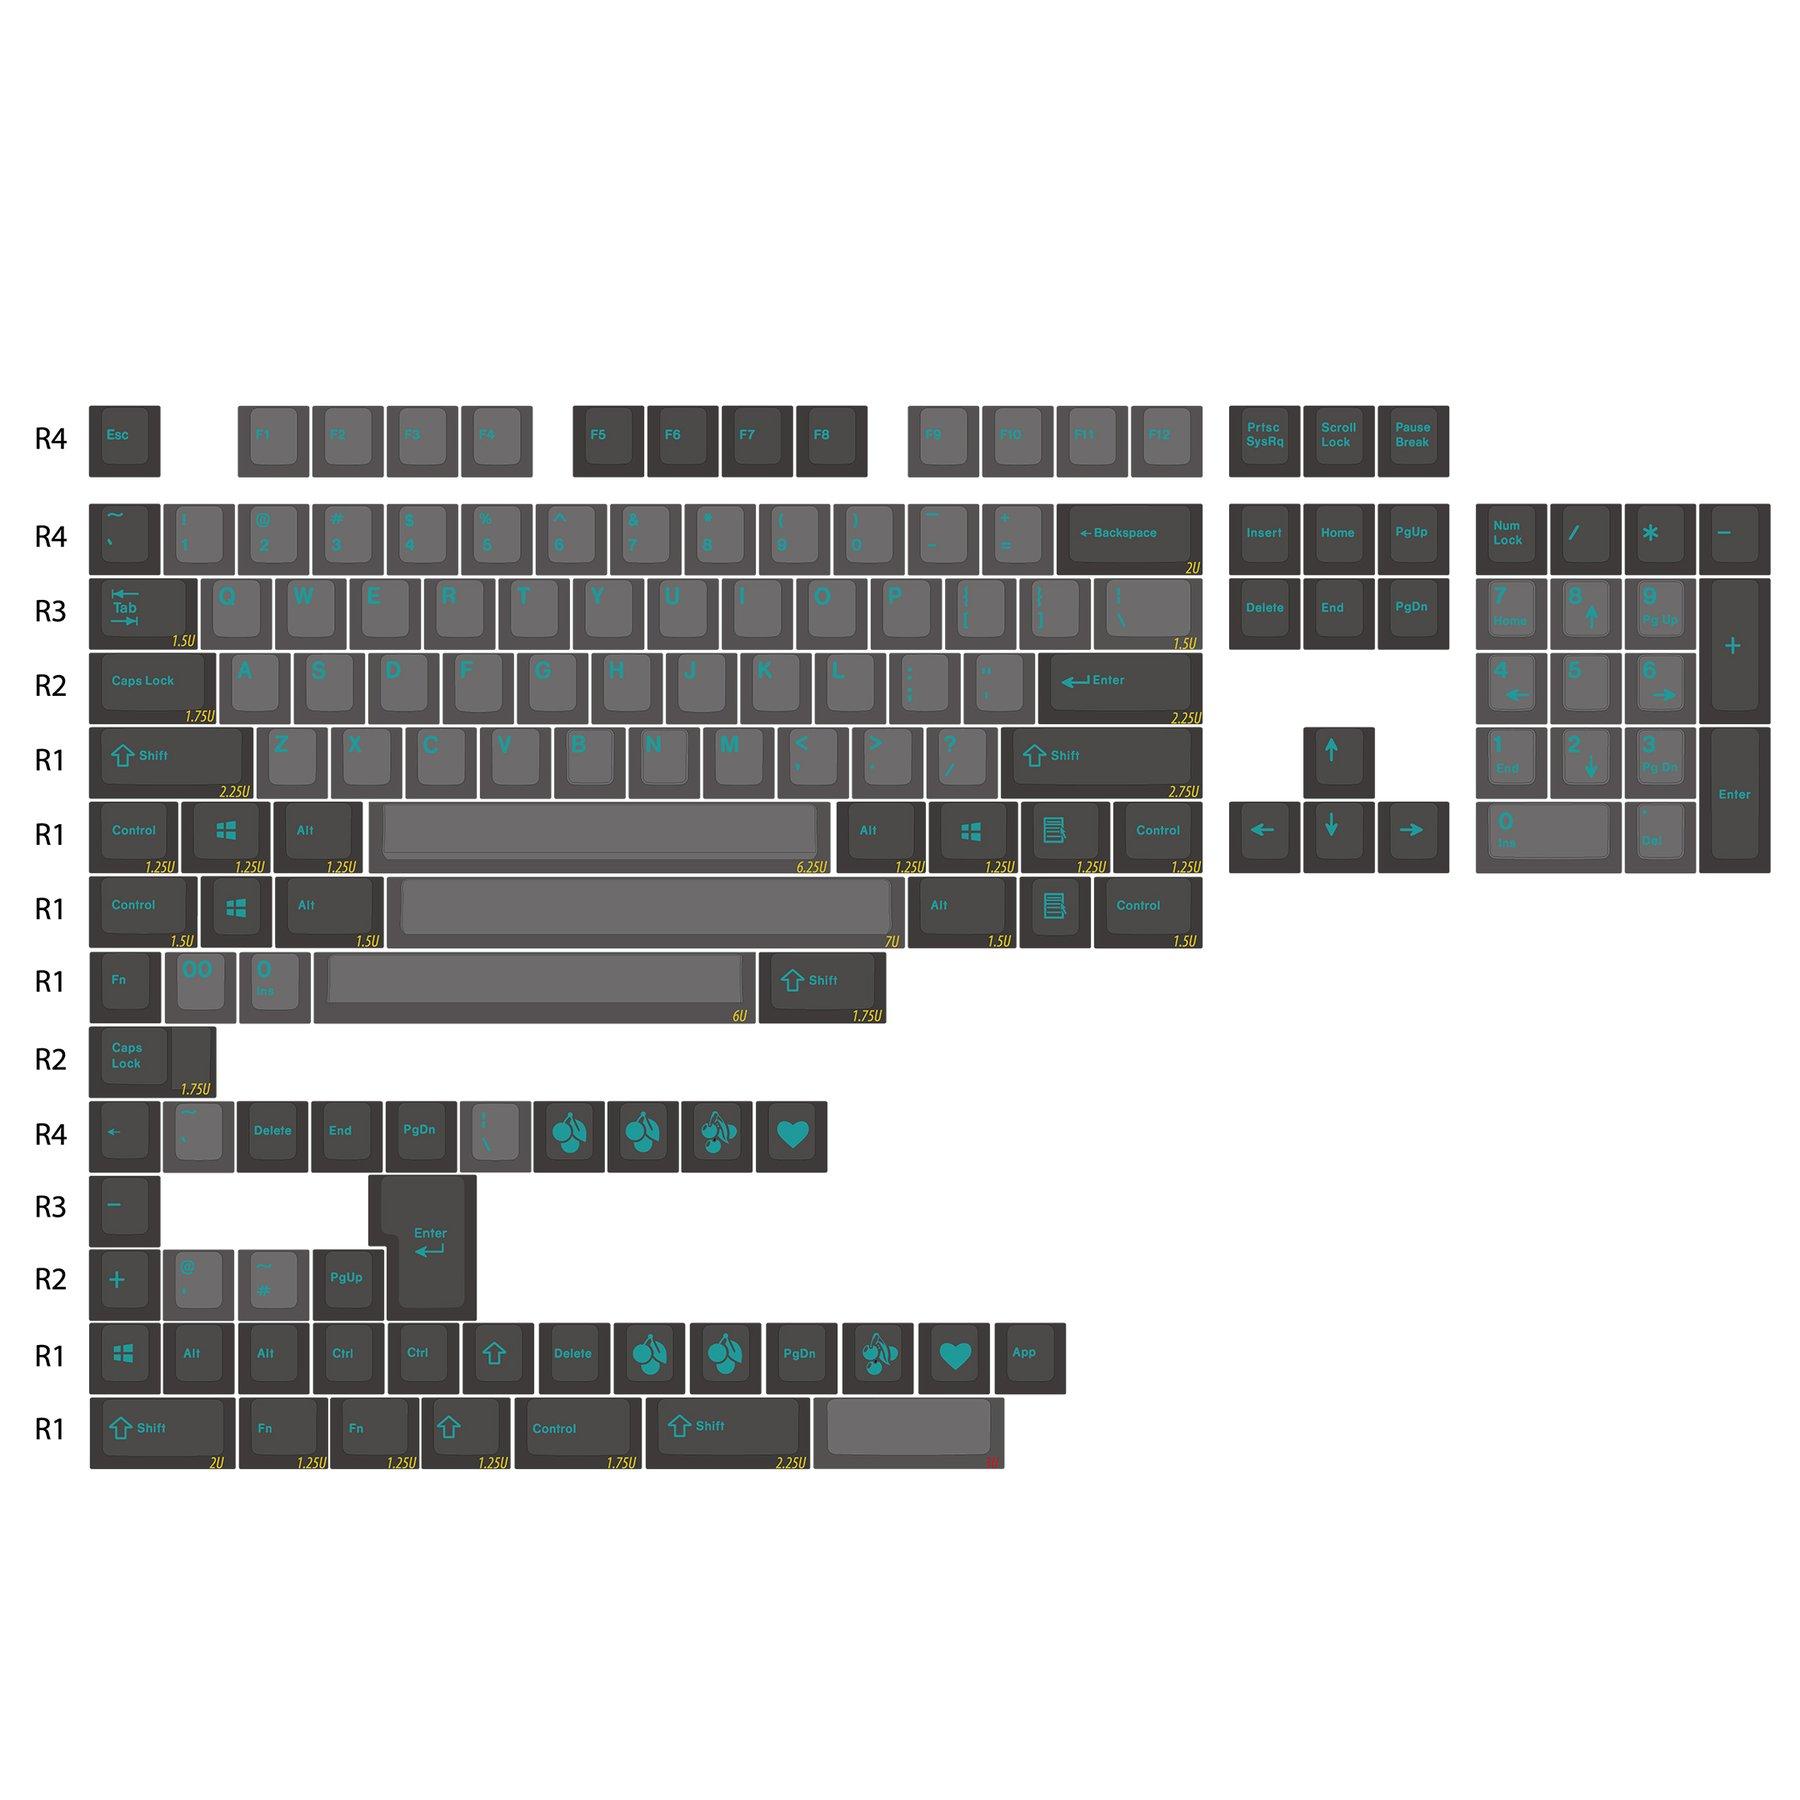 Enjoypbt غطاء مفتاح dolch سماوي 153 مفتاح ABS لونين حقن صب عملية مناسبة لمعظم لوحات المفاتيح الميكانيكية